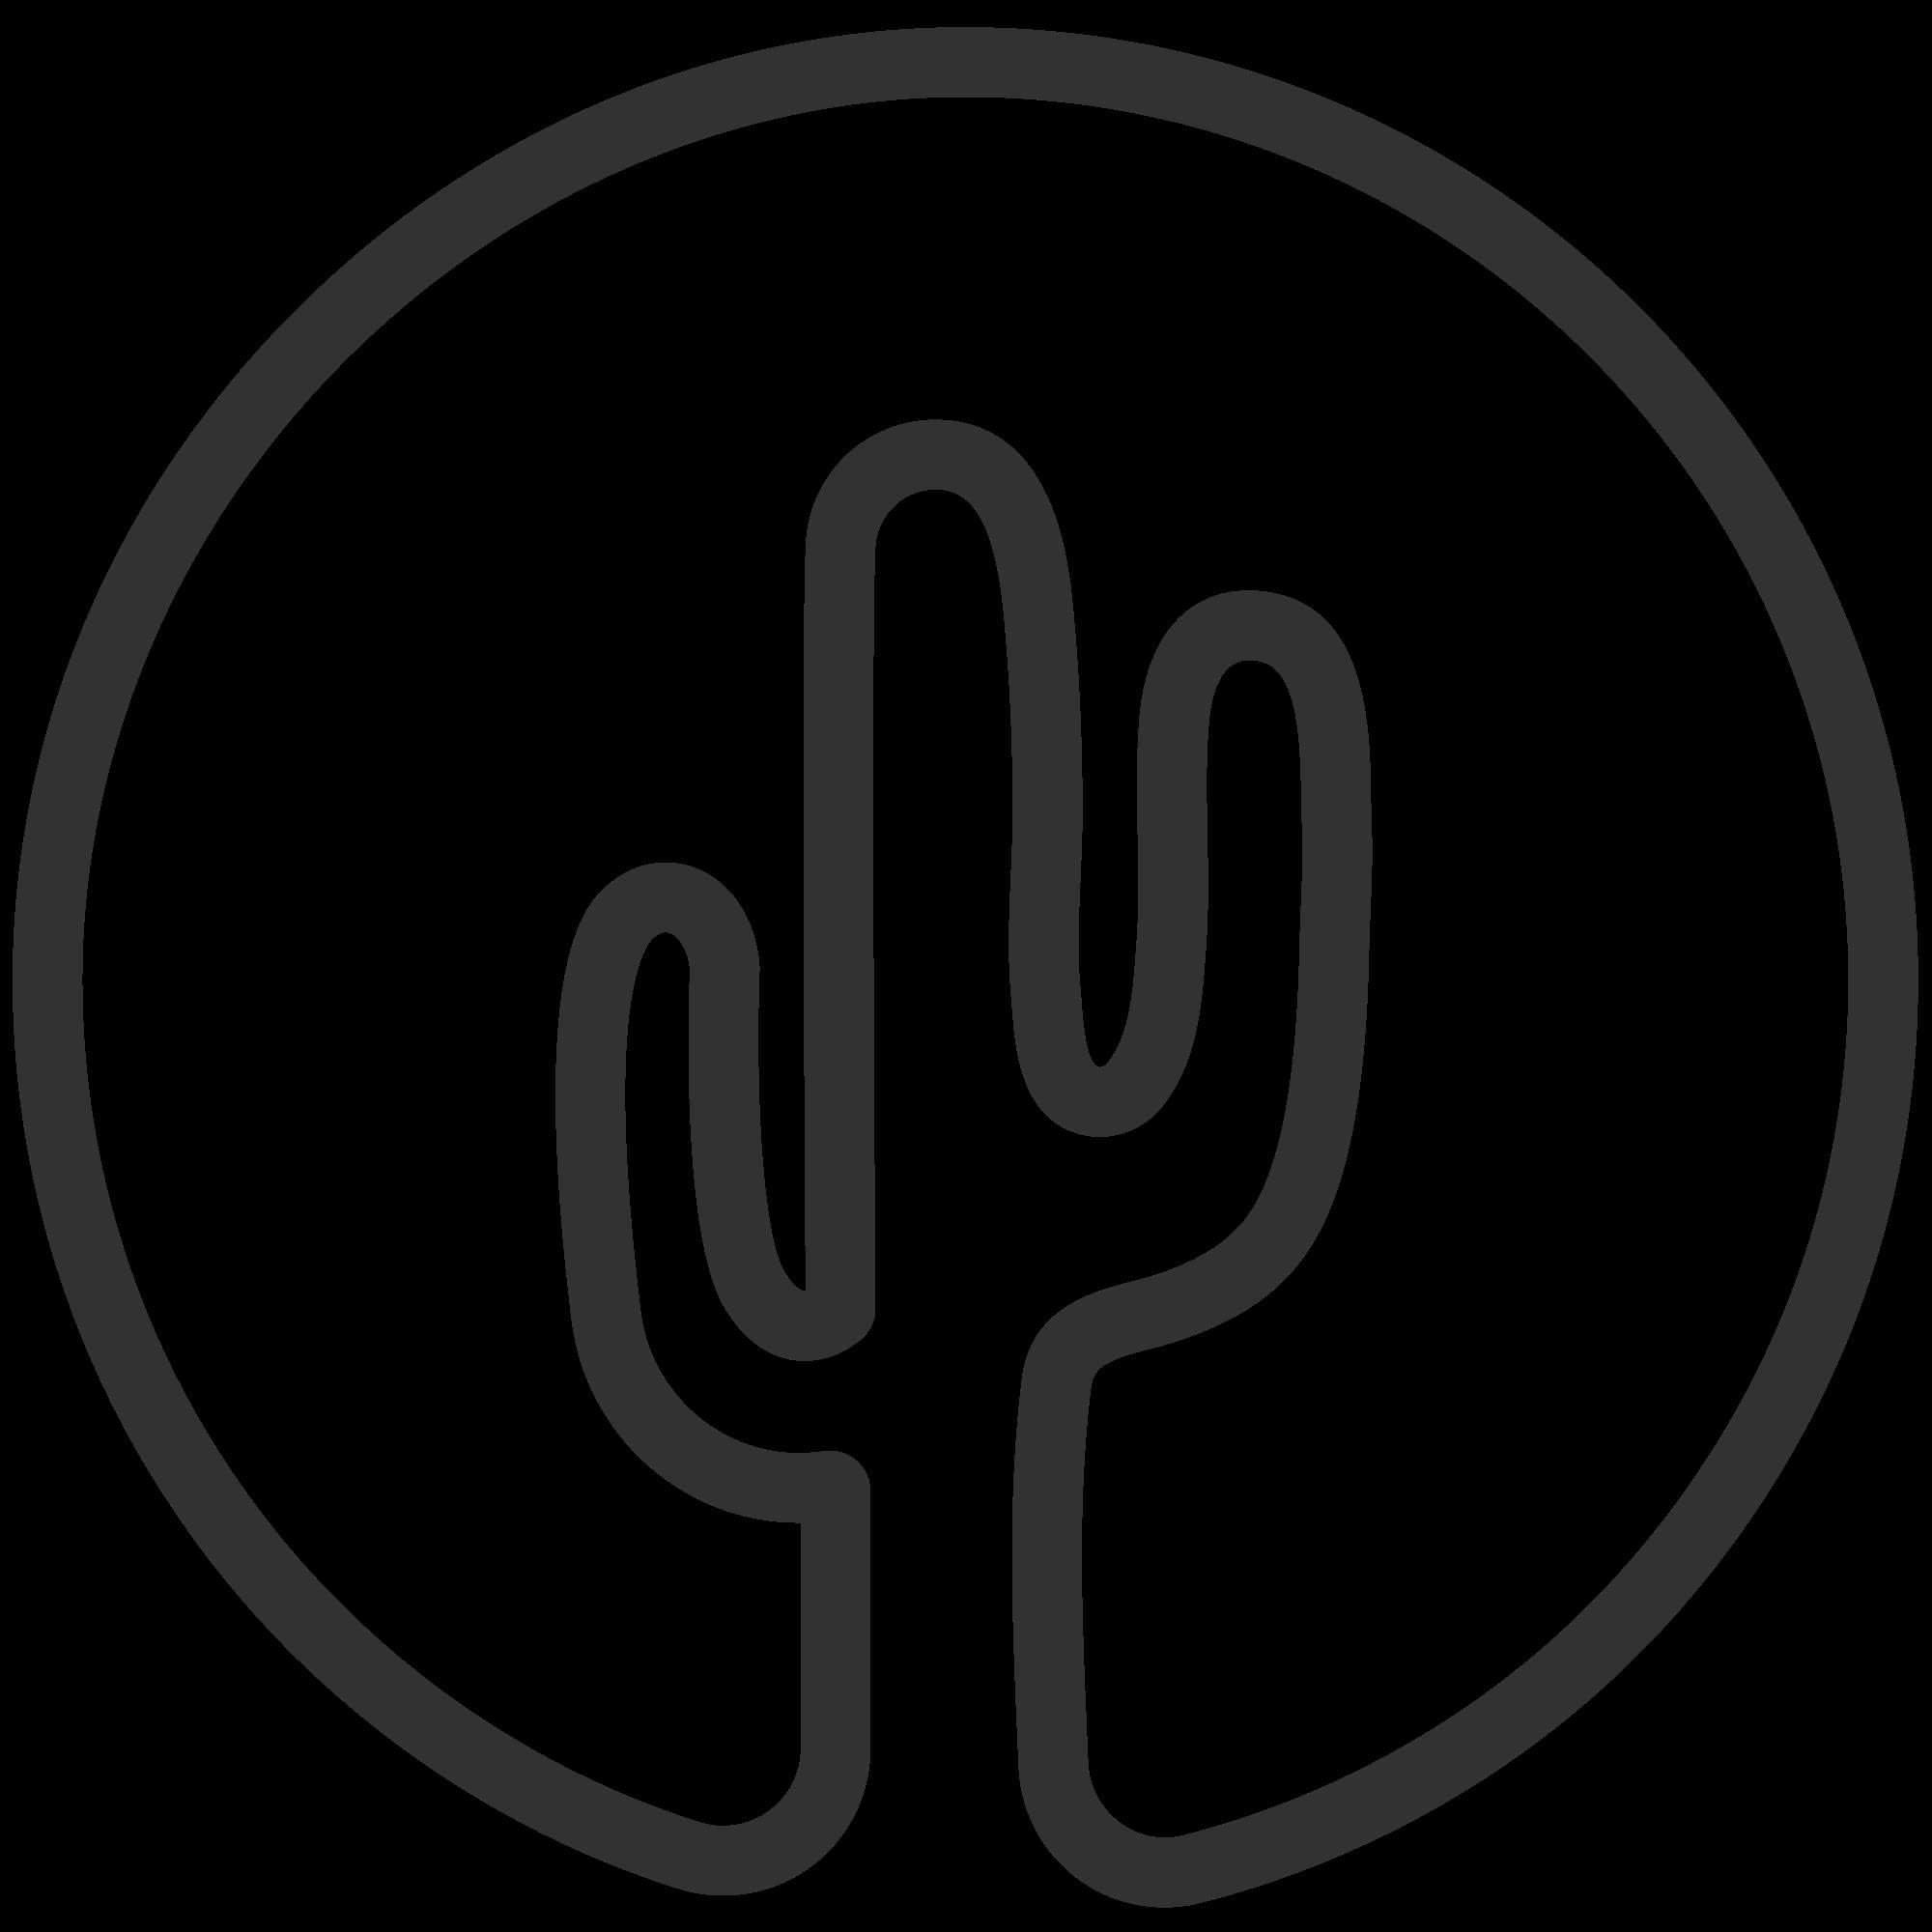 outline clipart cactus  outline cactus transparent free